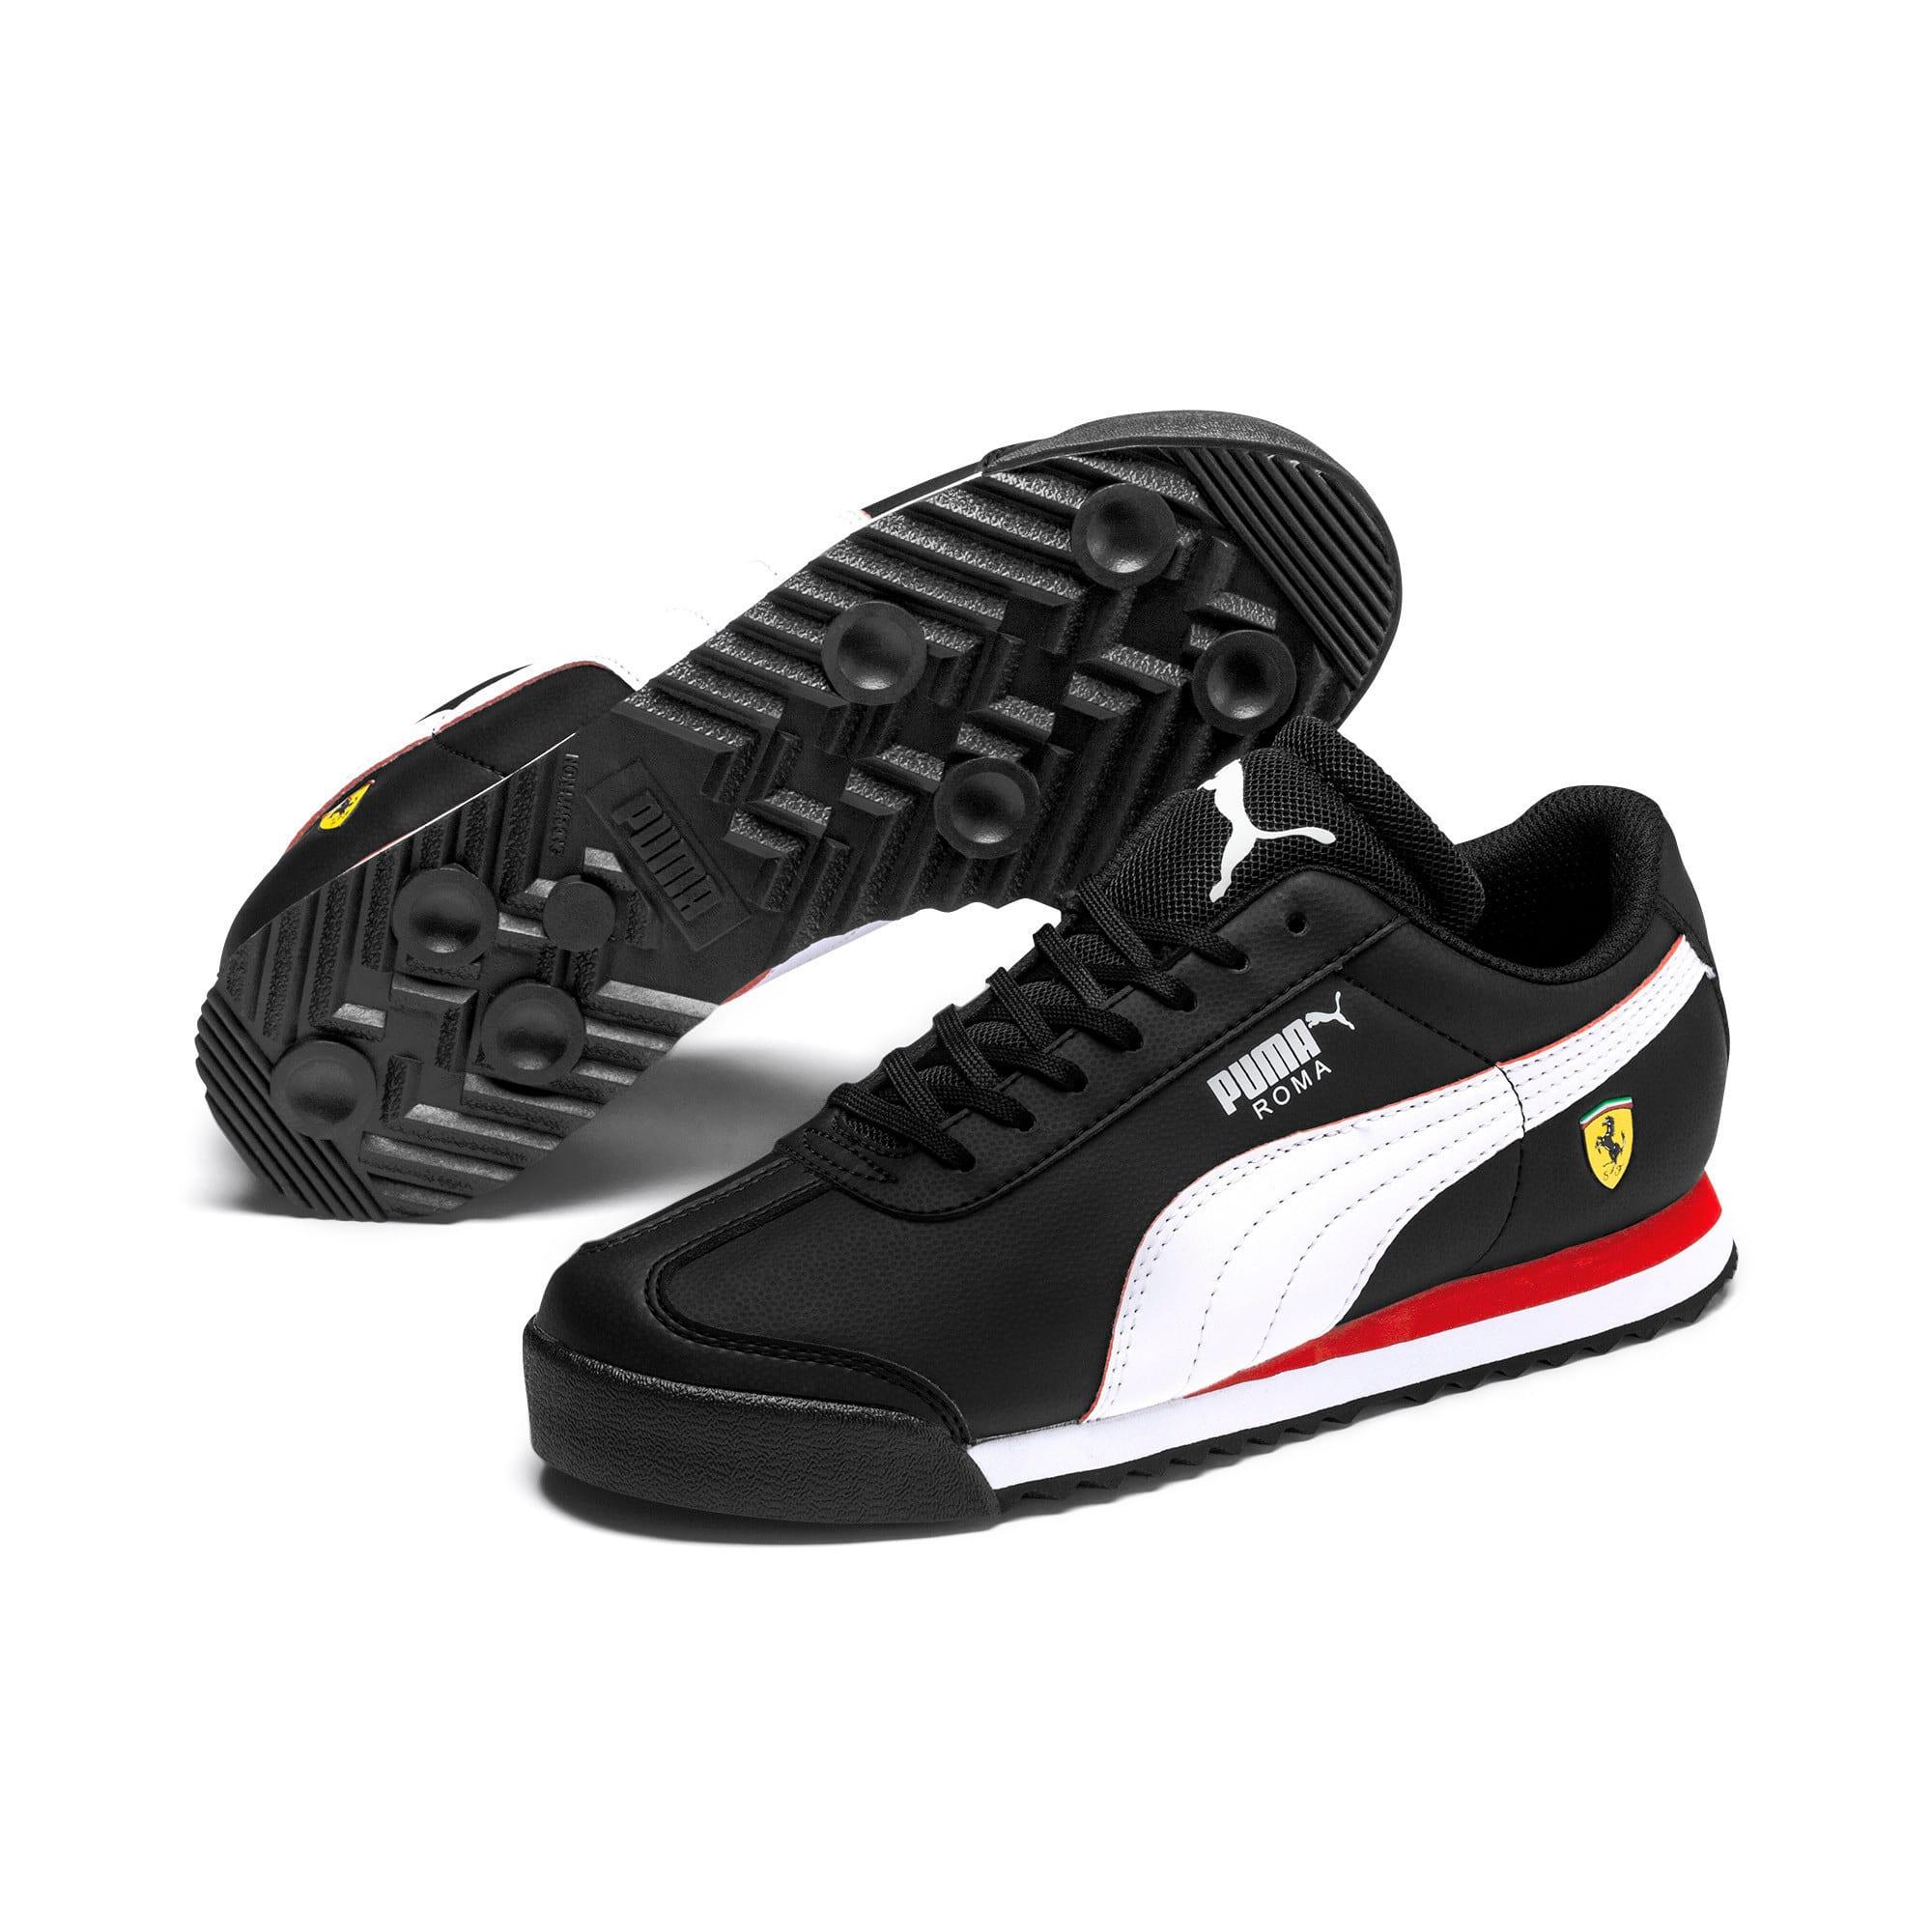 Thumbnail 6 of Ferrari Roma Youth Trainers, Black-White-Rosso Corsa, medium-IND